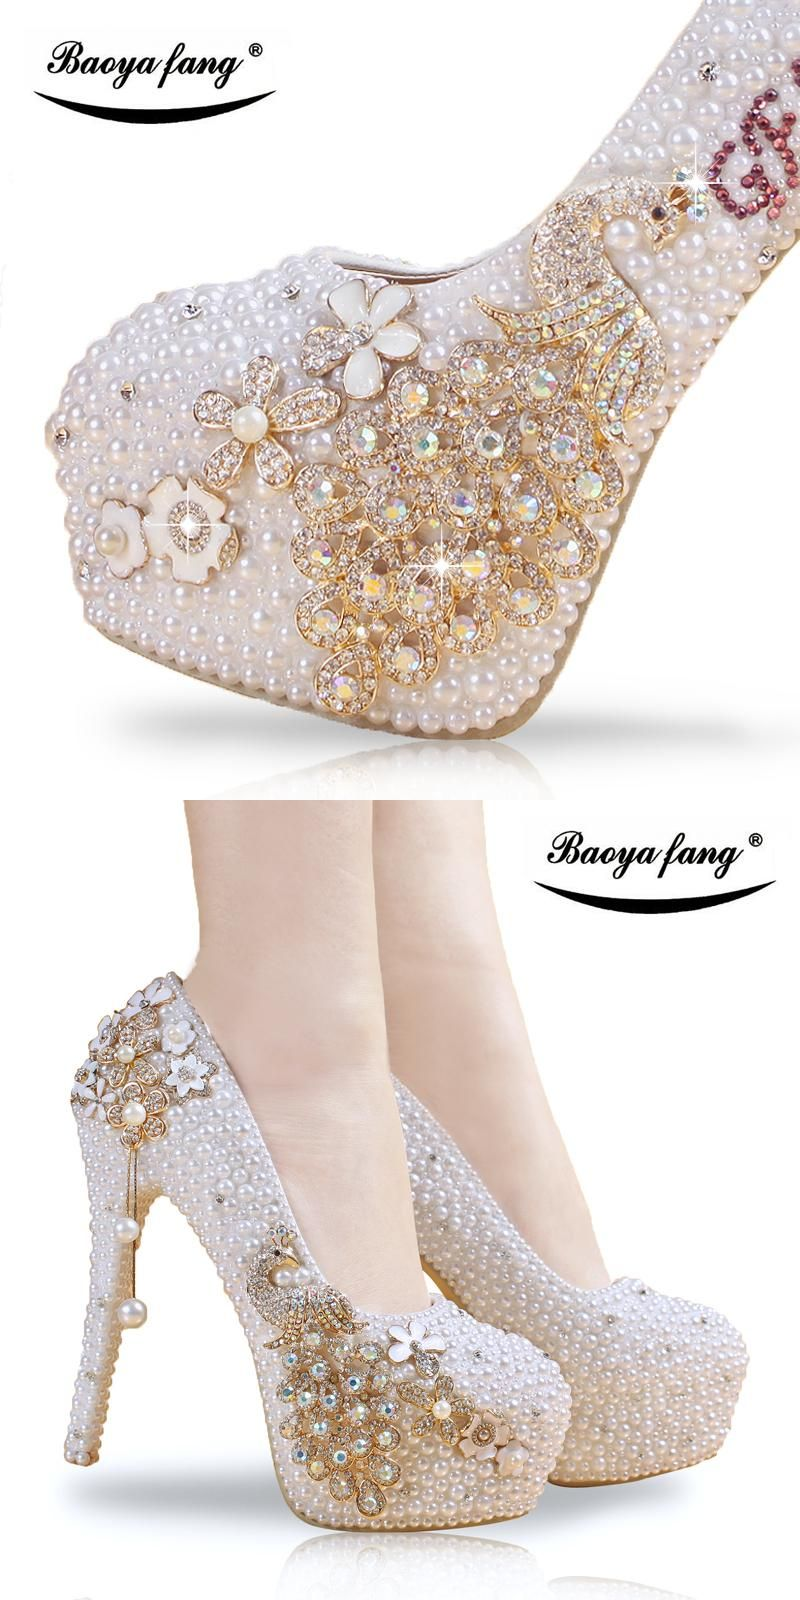 9a1848d6b74f Crystal wedding shoes pearl handmade bridal shoes women s Pumps peacock  rhinestone female high heels platform shoes big size